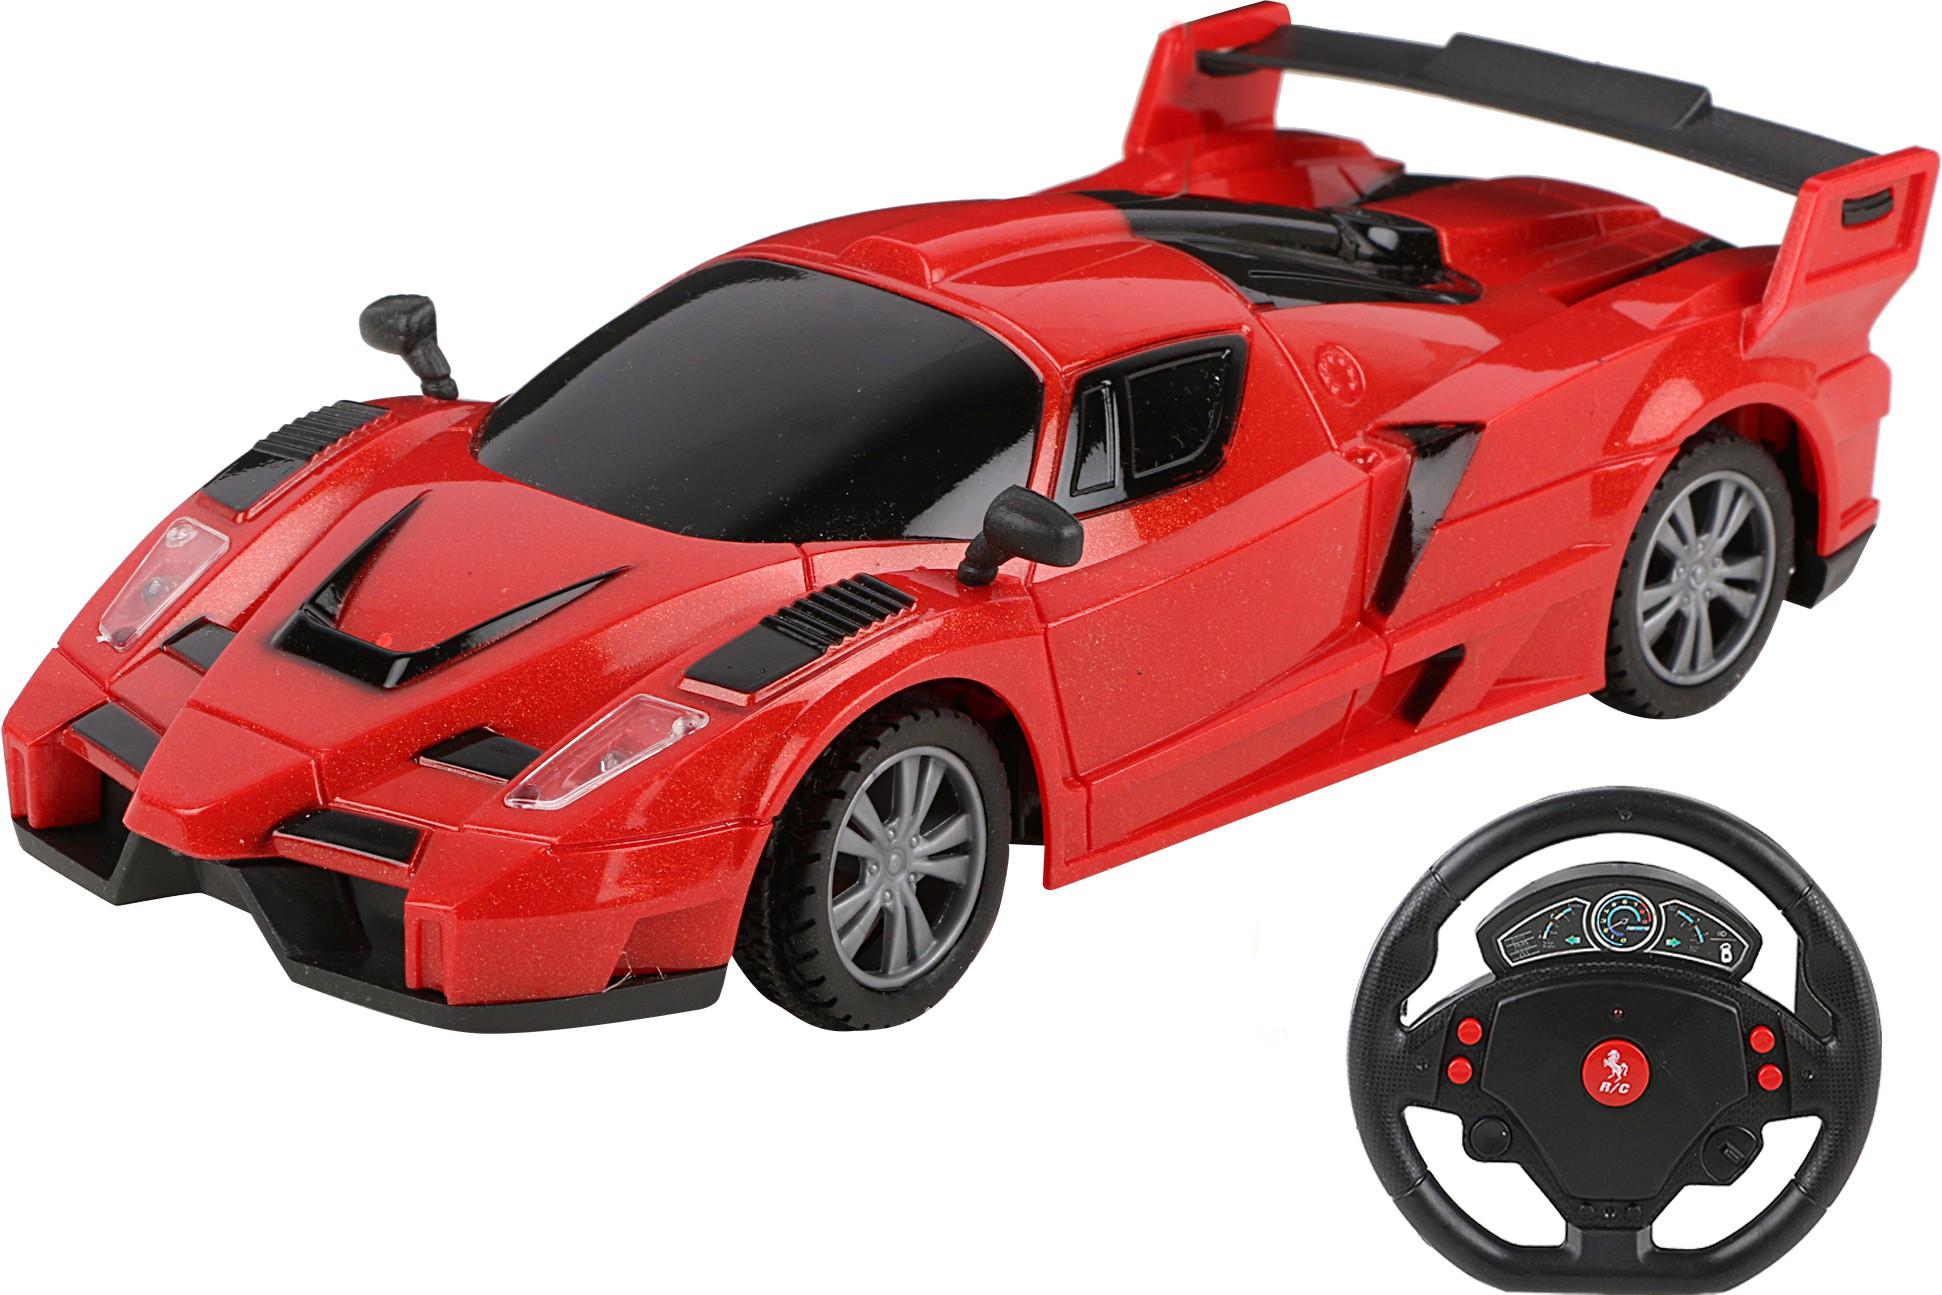 Deals - Bangalore - RC Cars <br> Best Sellers<br> Category - toys_school_supplies<br> Business - Flipkart.com